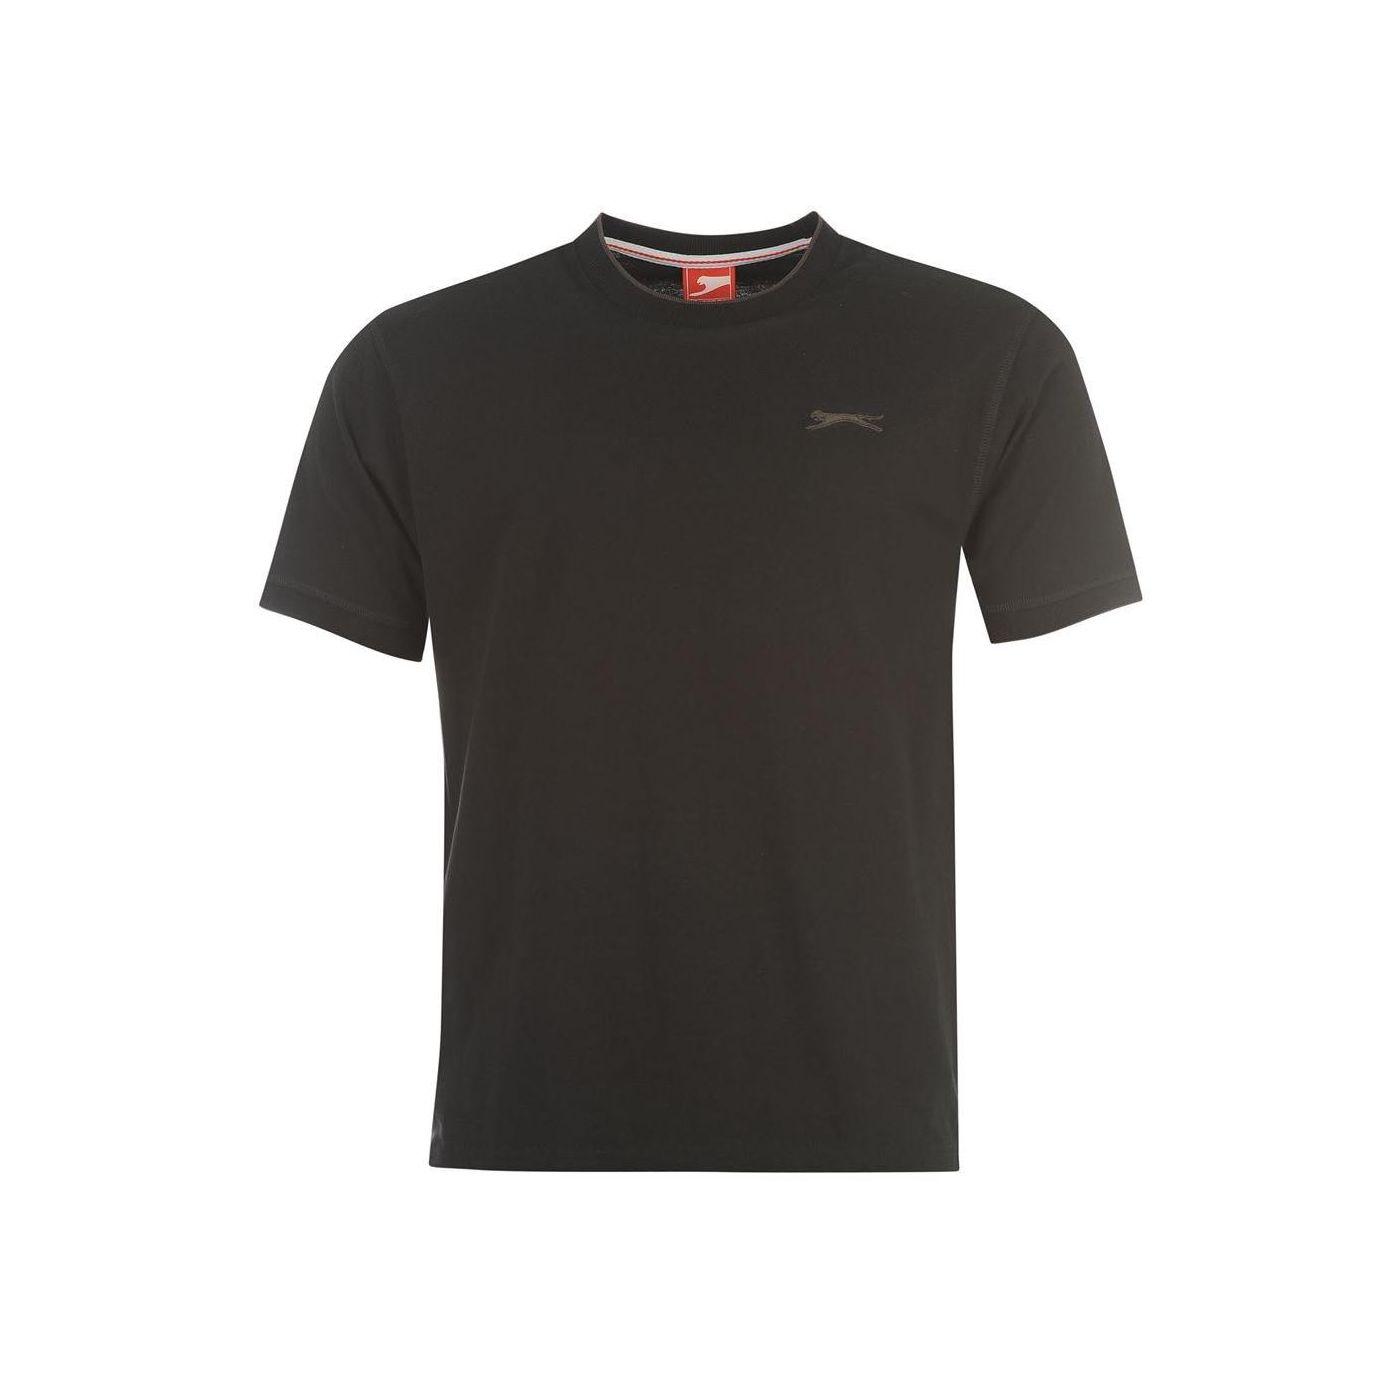 Triko Triko Slazenger Tipped T Shirt pánske